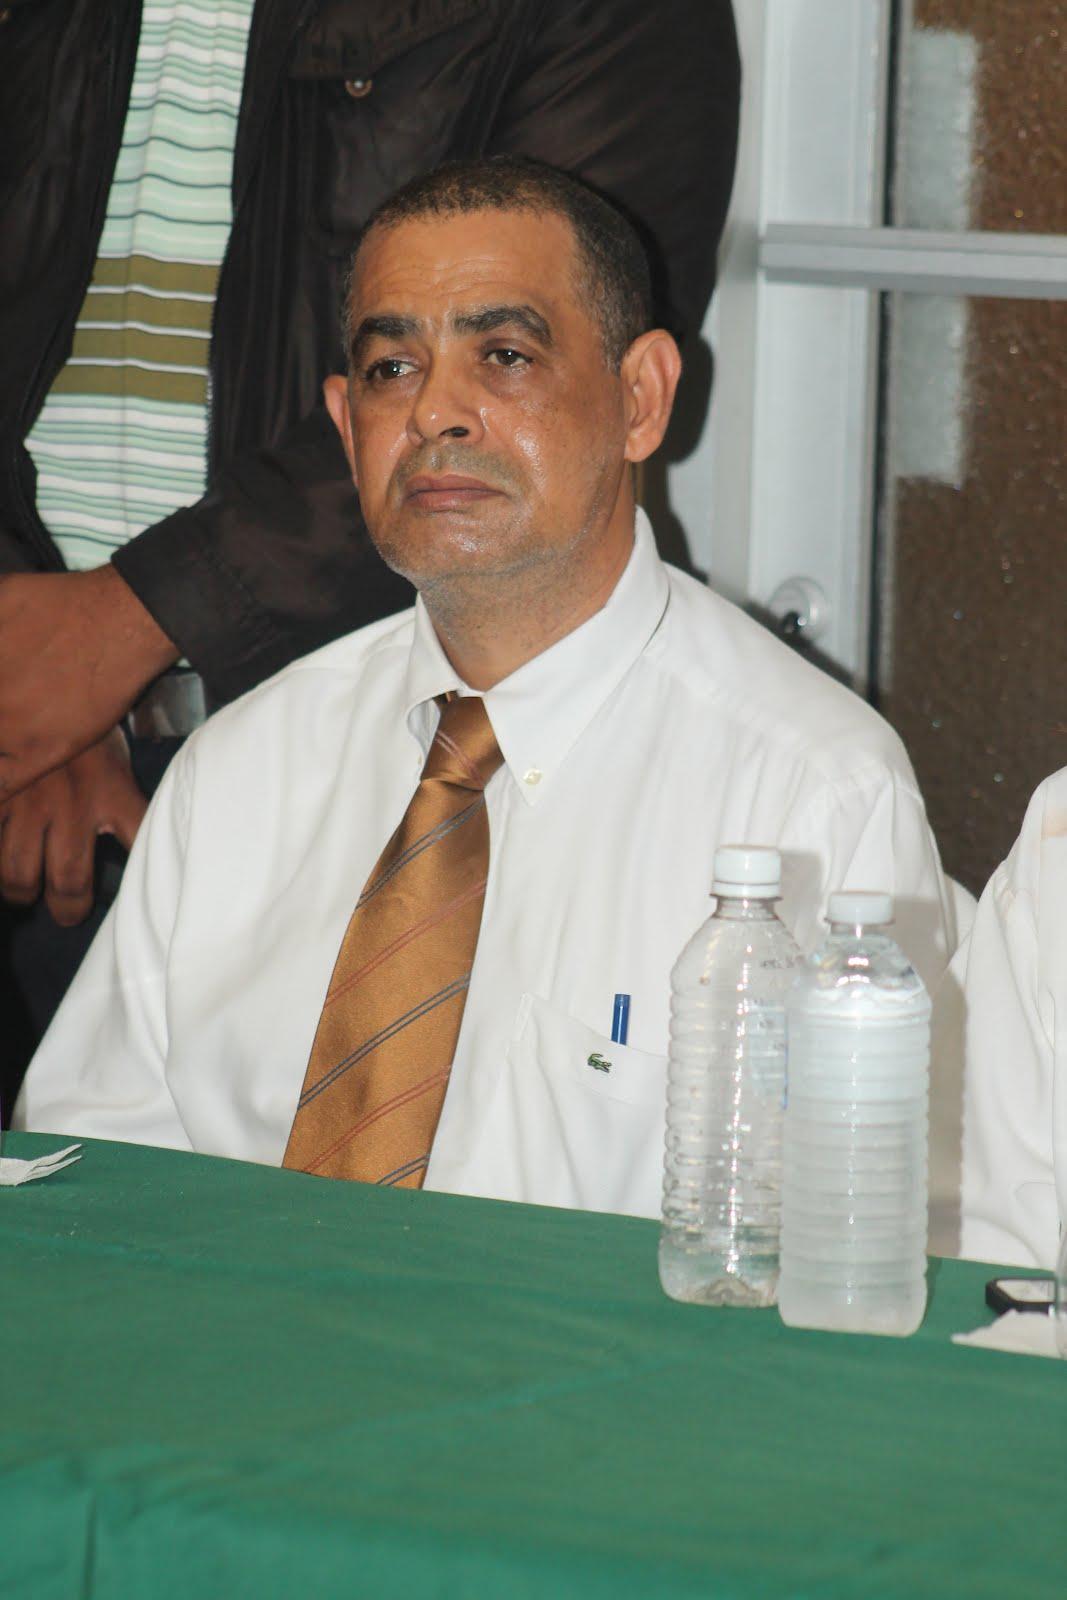 Dr. Pedro Ramirez